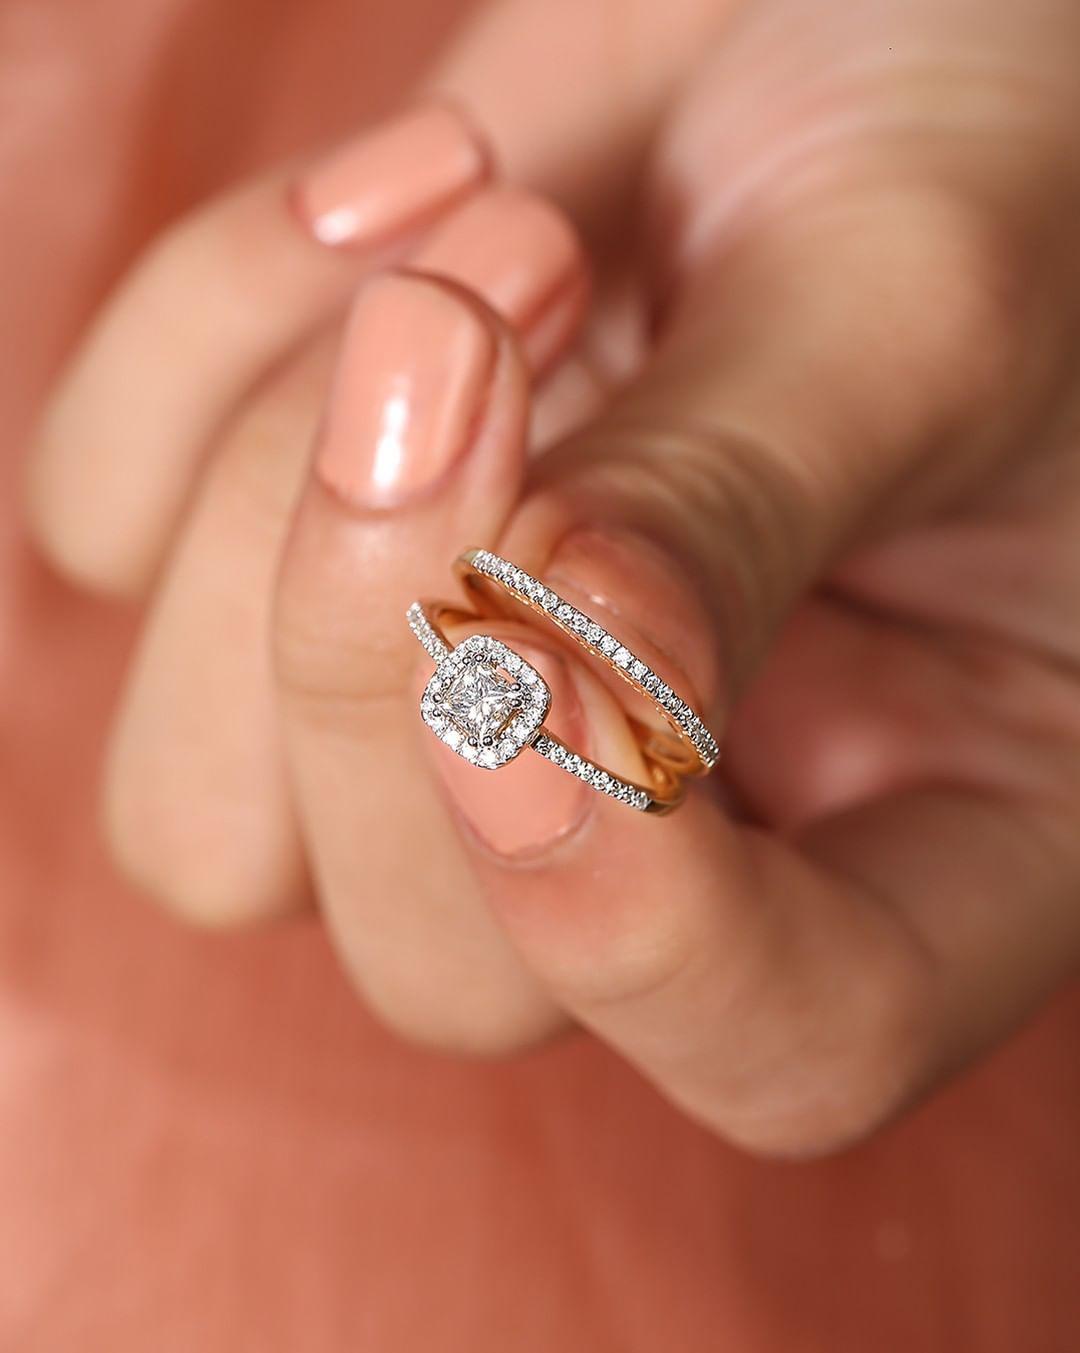 , engagement bands for brides , diamond bands for indian brides , round diamond ring for indian brides , Diamond Engagement Rings, silver lehenga , bridal lehenga for pastel brides